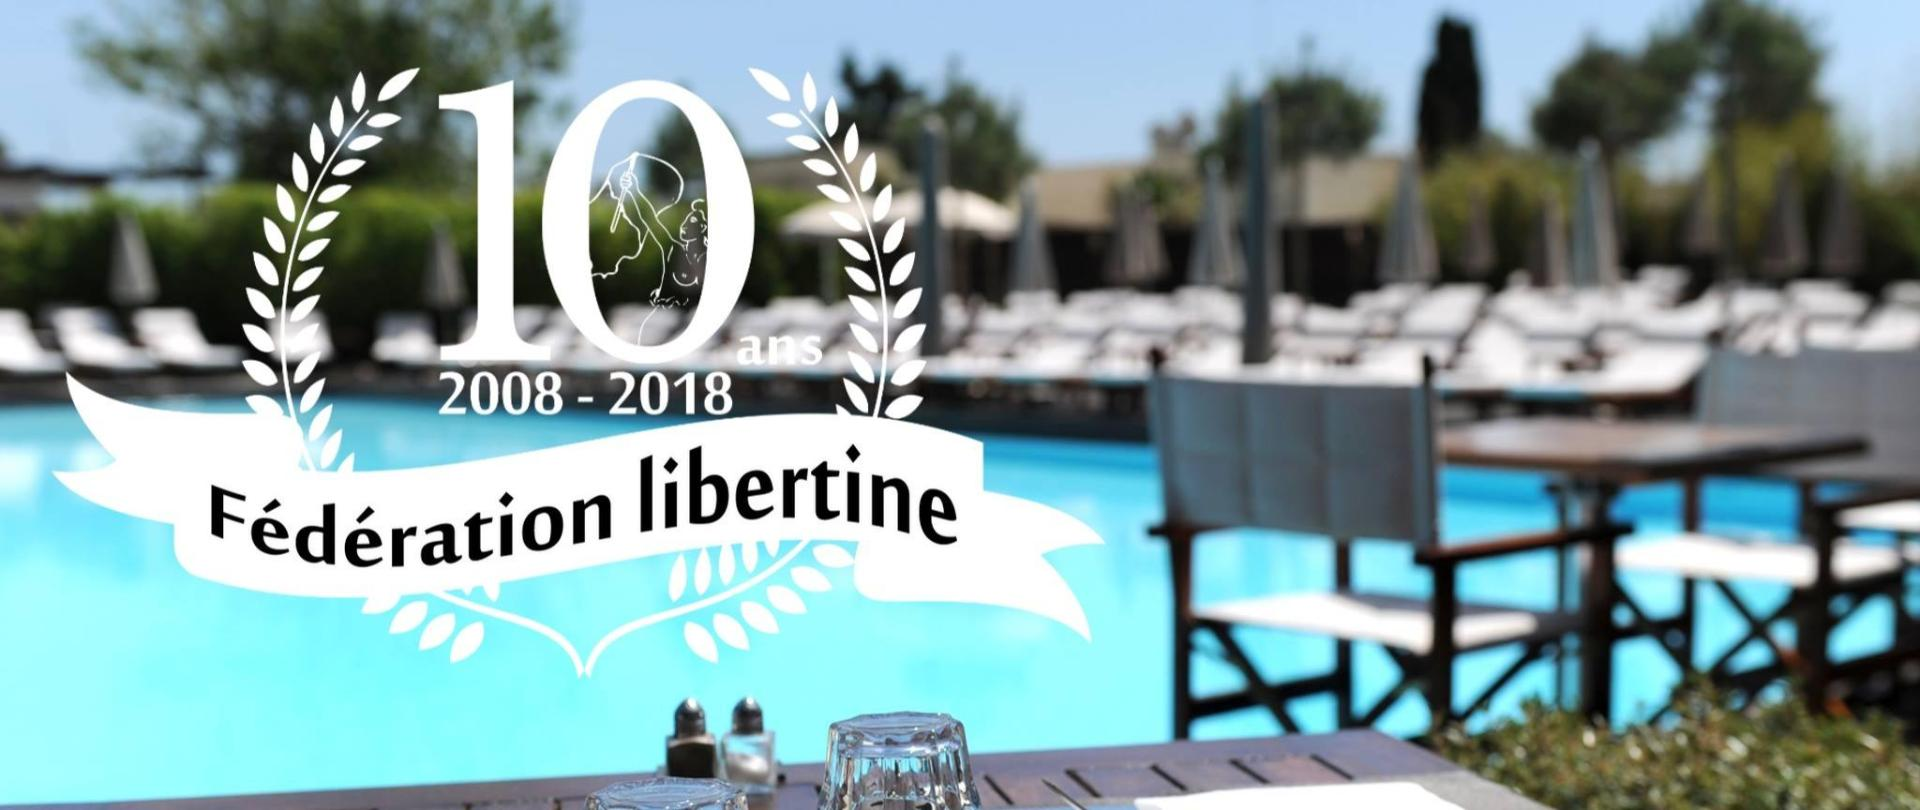 Fédération Libertine 2008 - 2018 Cap d Agde (13).jpg